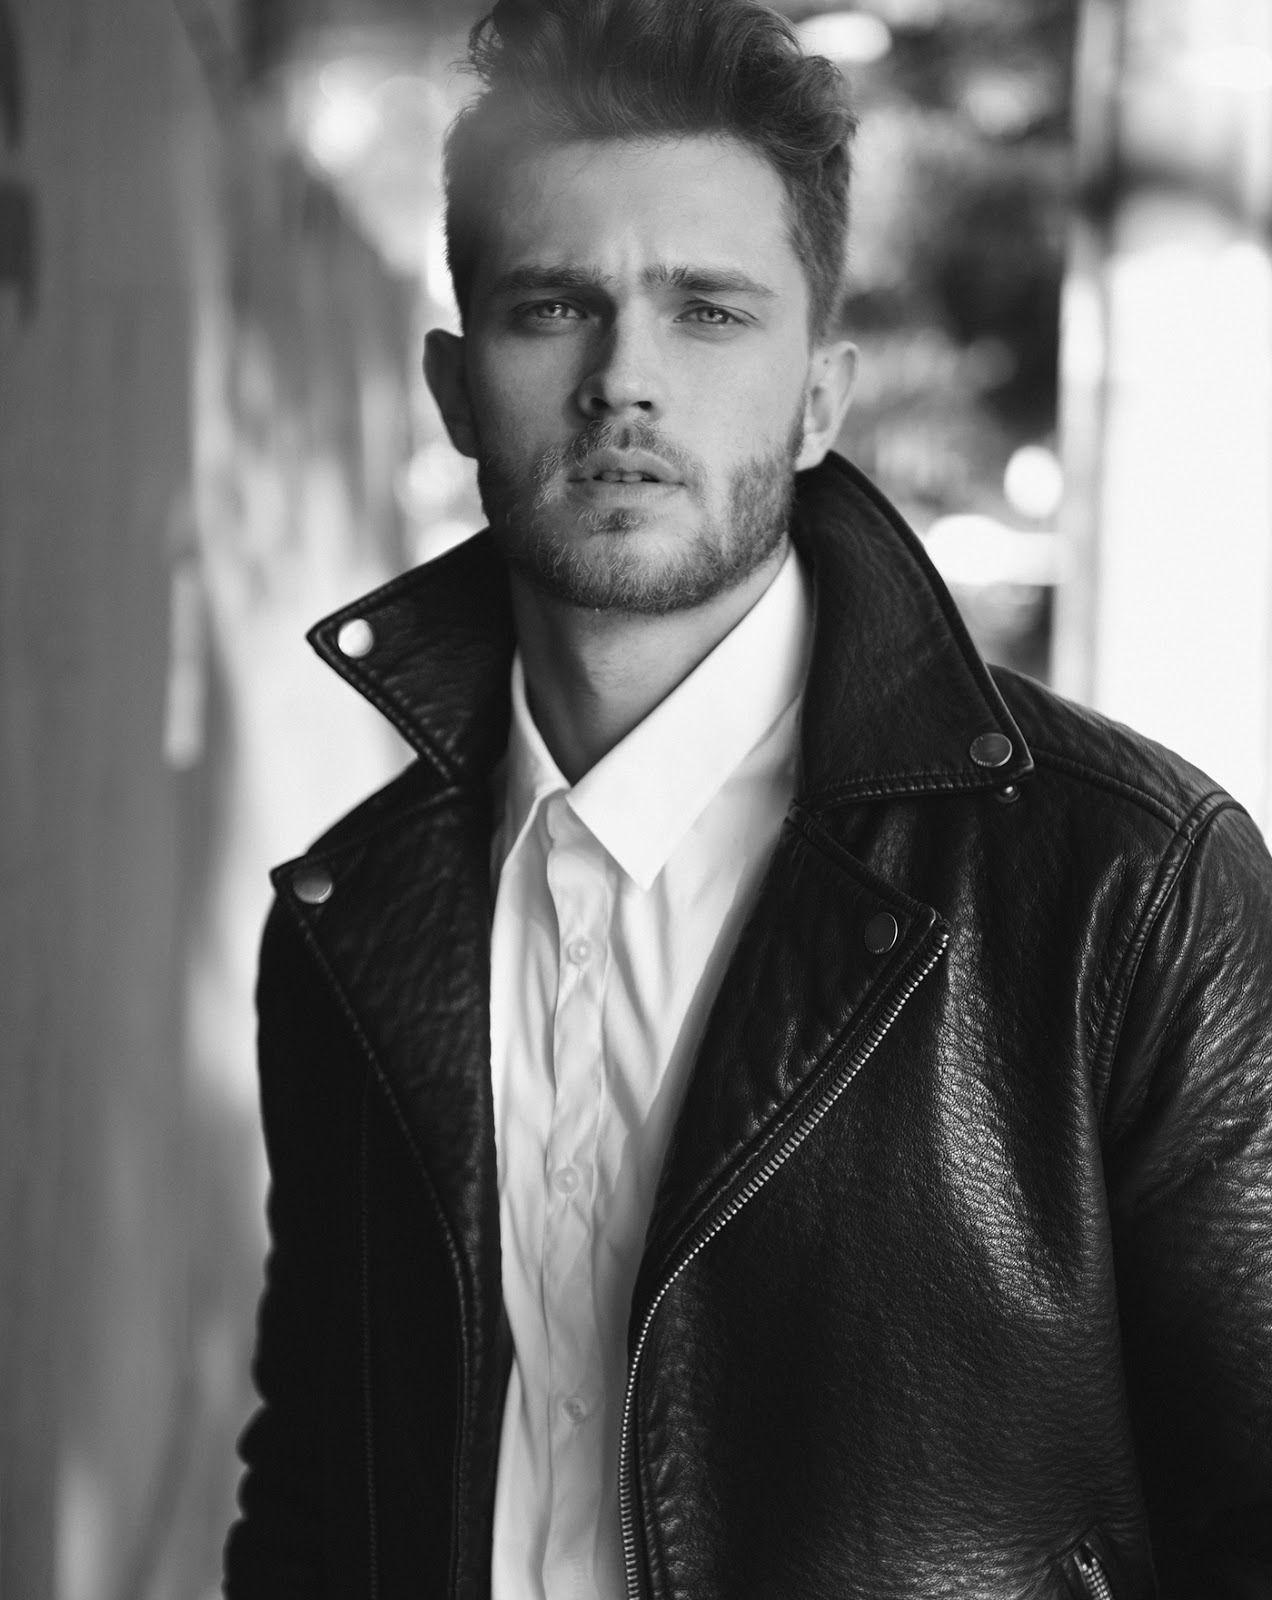 Hot Male Models Anderson Weisheimer Hot Male Models Male Models Leather Jacket Men [ 1600 x 1272 Pixel ]